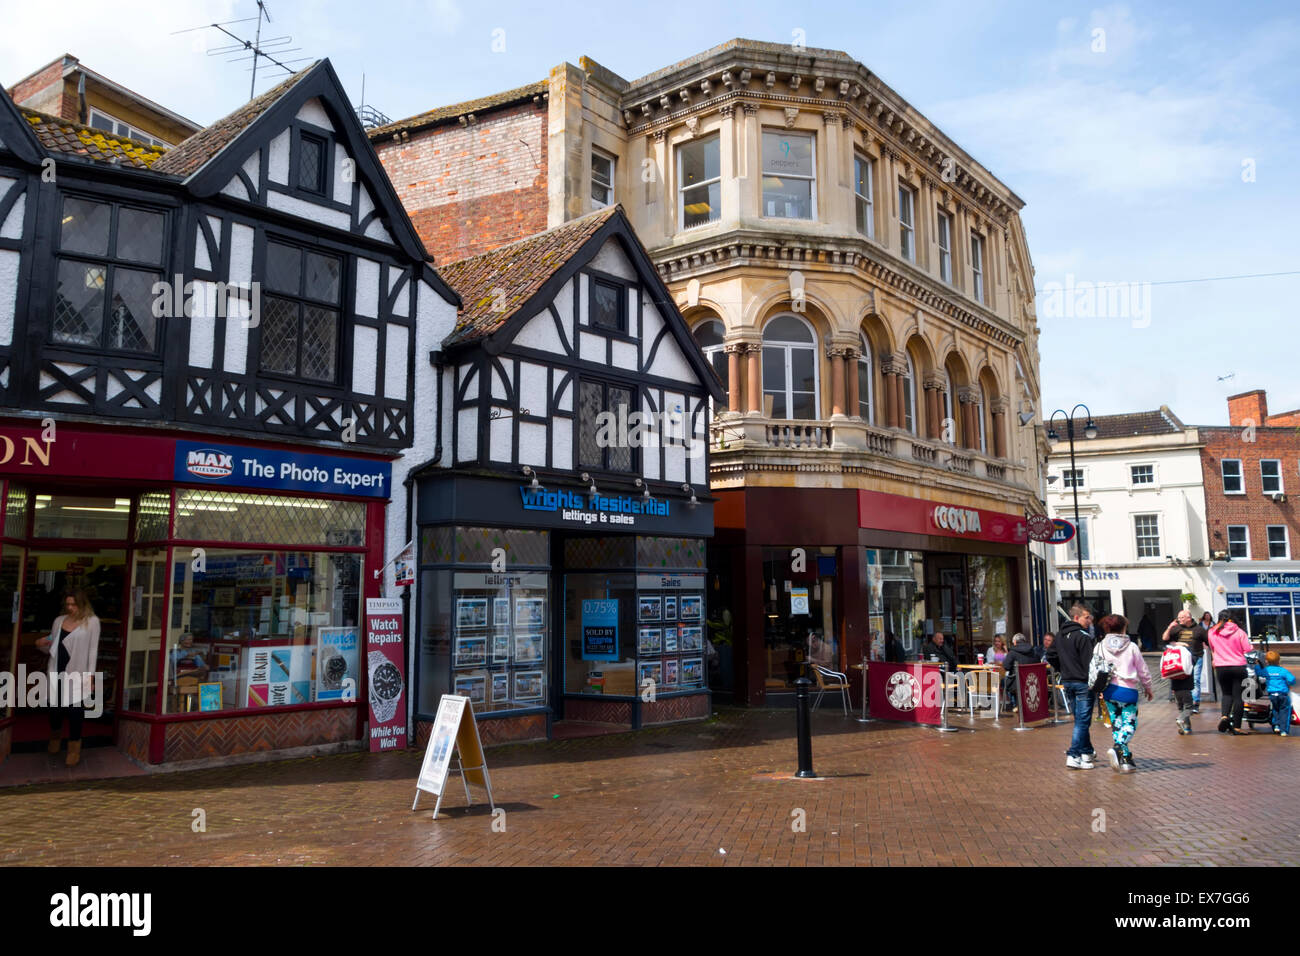 Fore Street, Trowbridge, Wiltshire, United Kingdom. - Stock Image